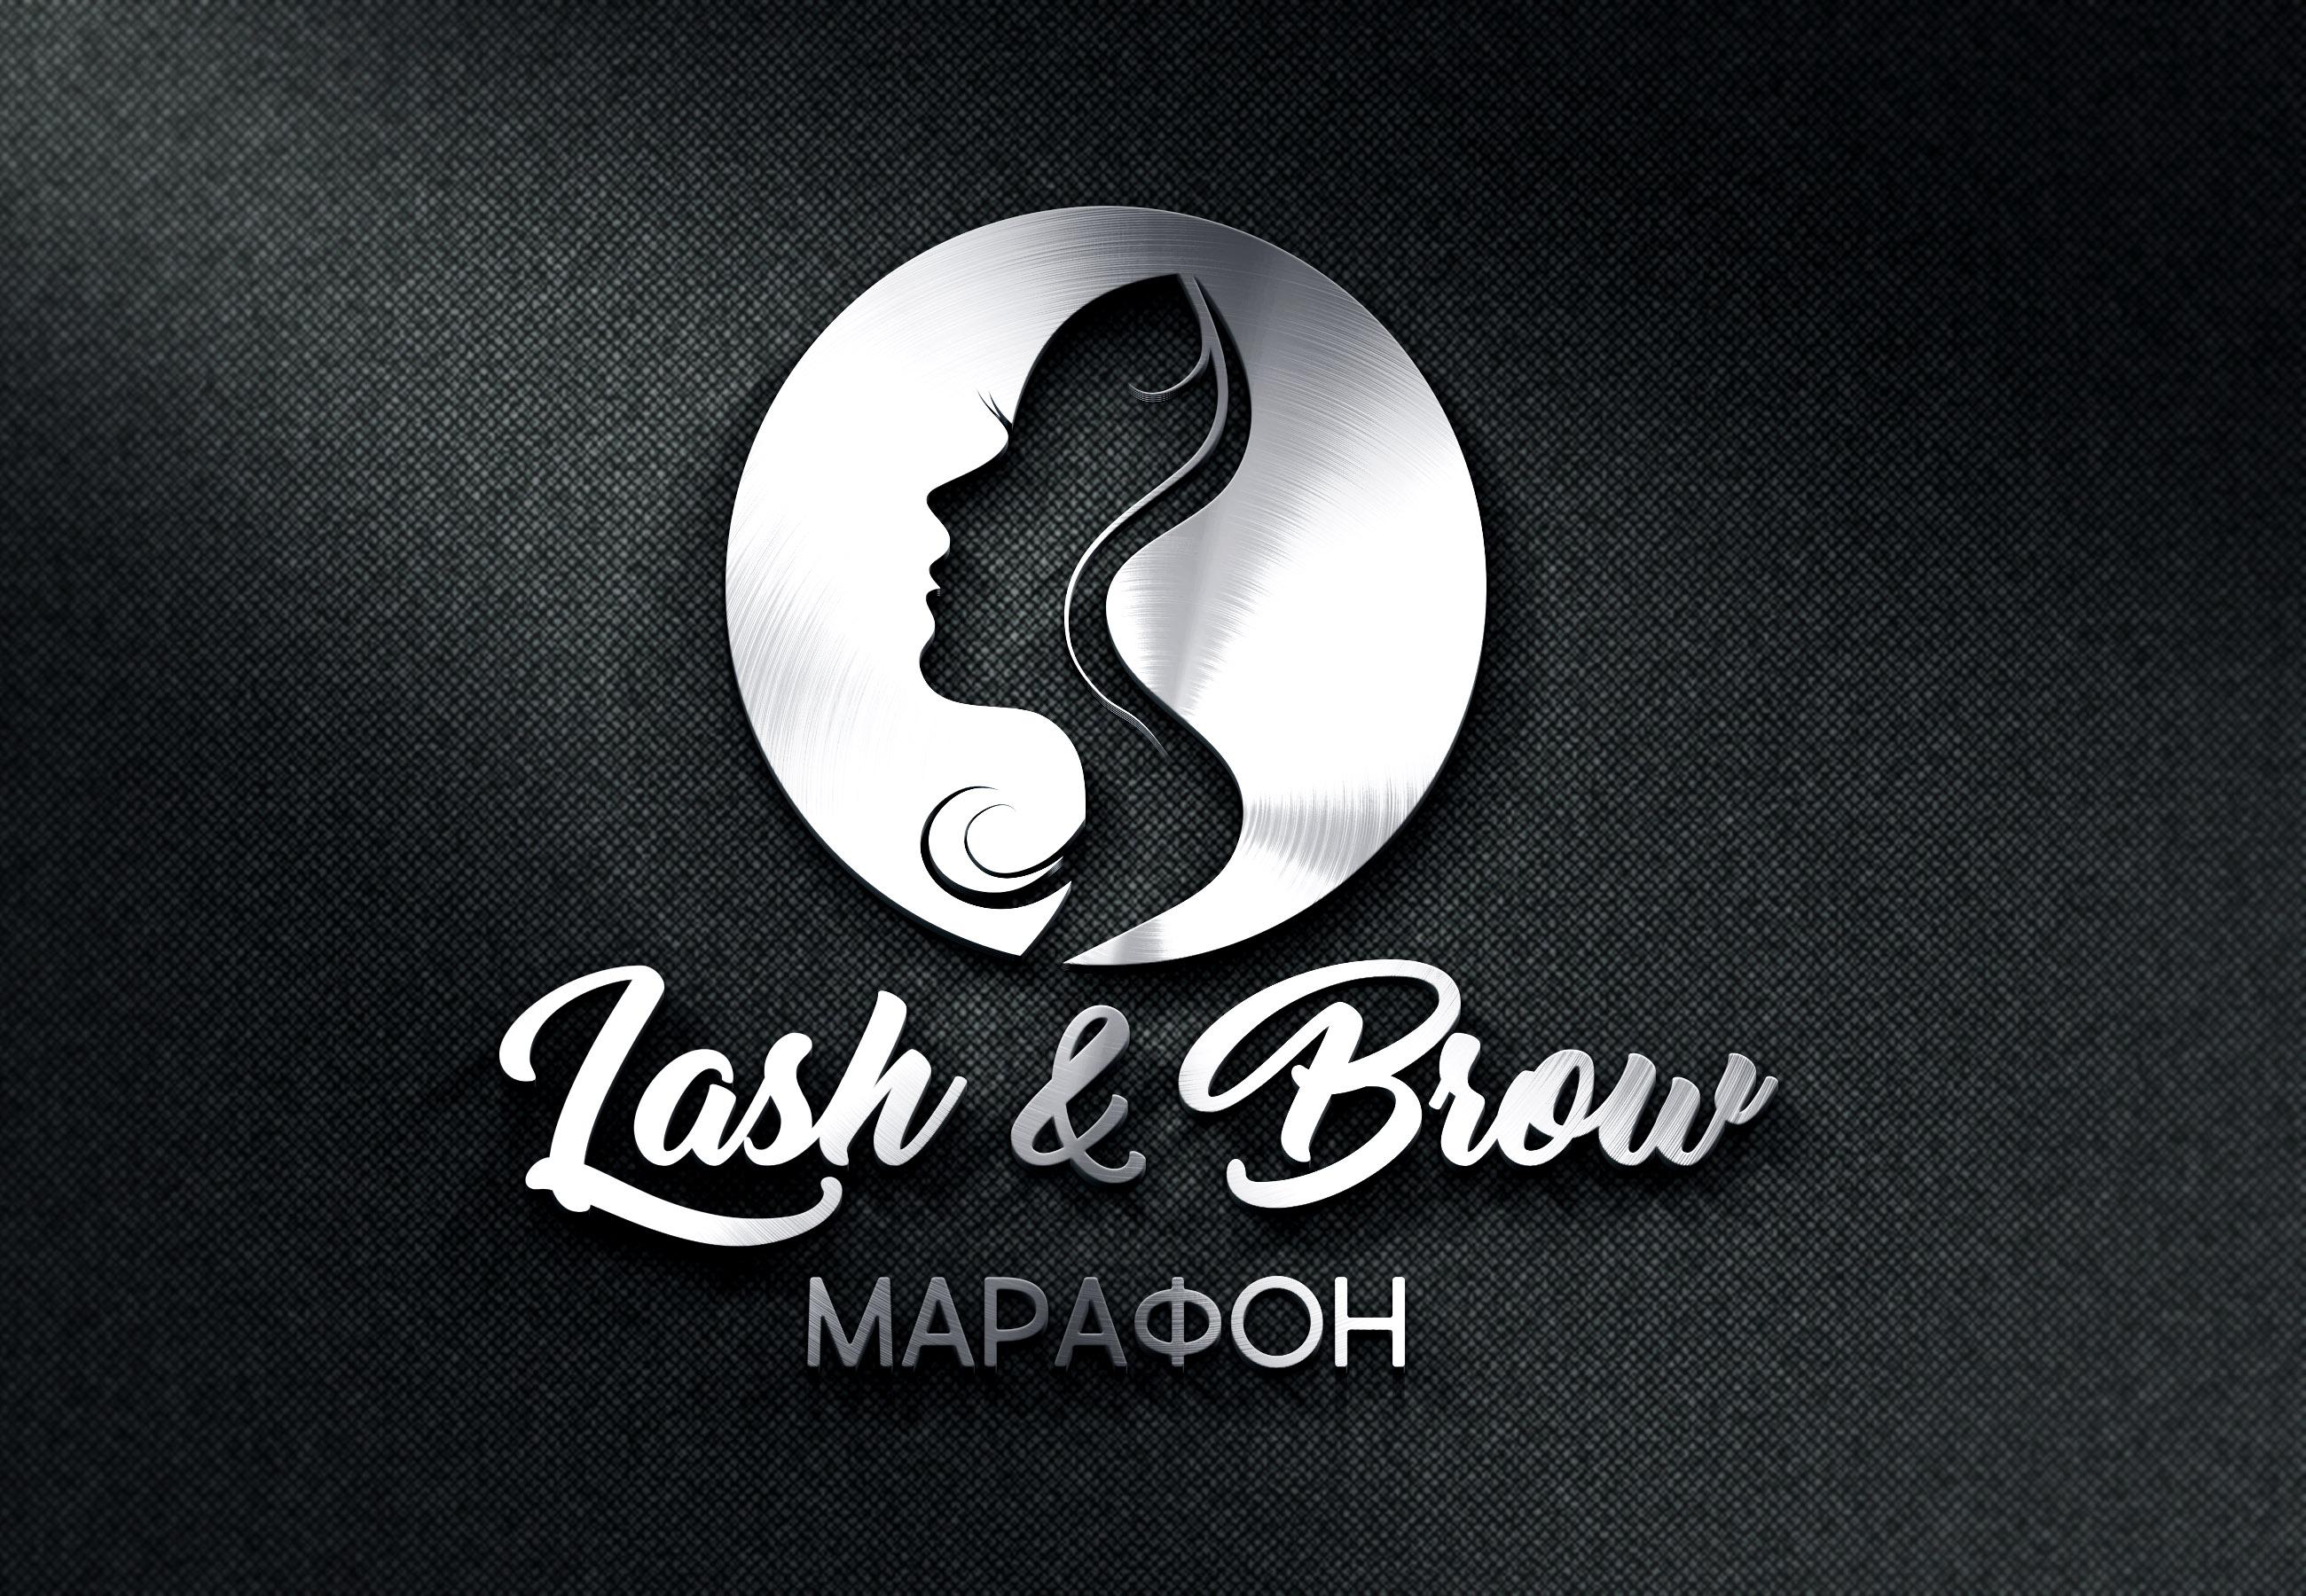 "Создание логотипа мероприятия ""Марафон Lash&Brow"" фото f_54458f90d1625d11.jpg"